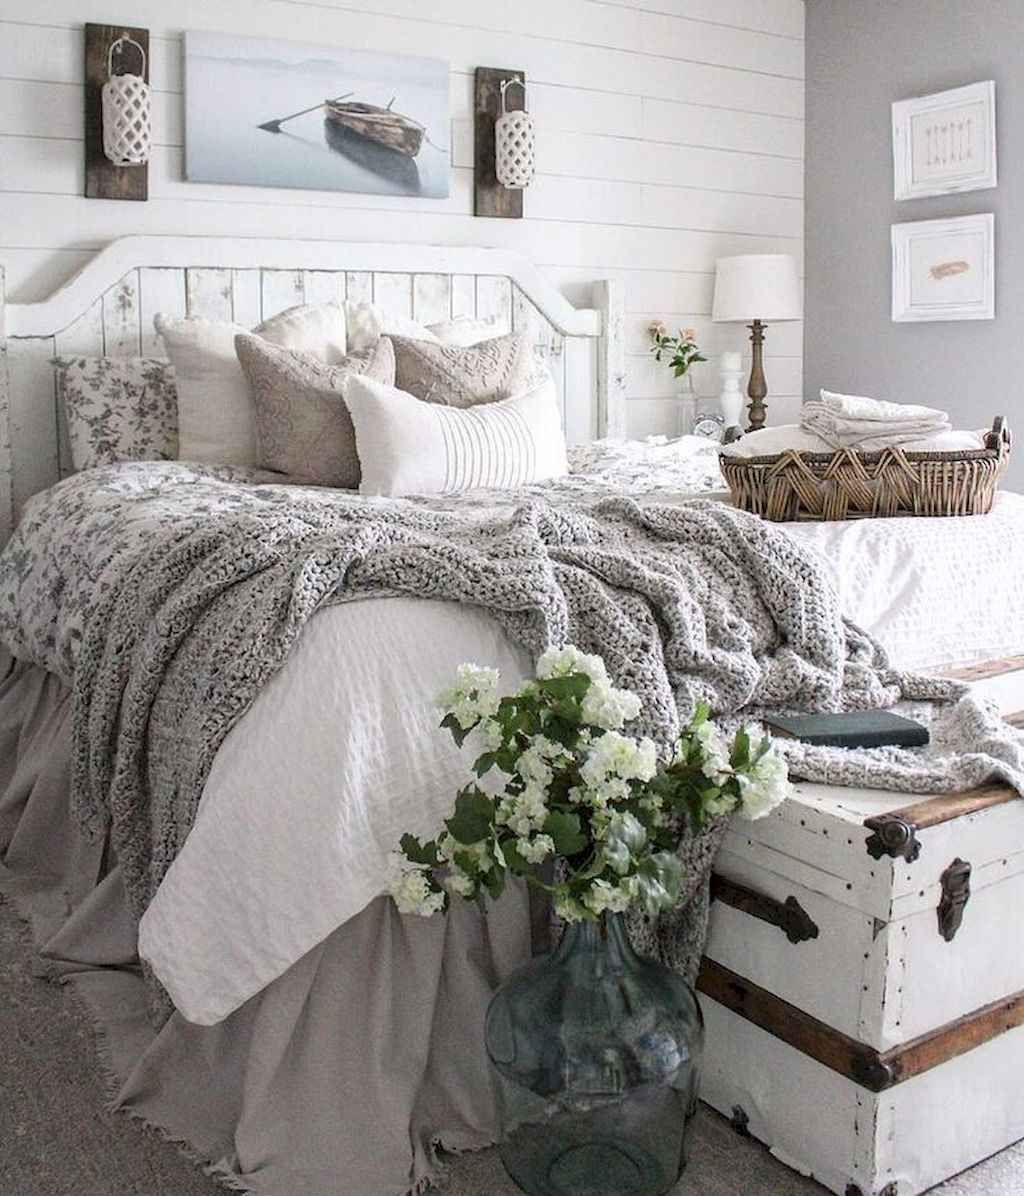 65 Farmhouse Master Bedroom Decorating Ideas | bedroom ideas ...